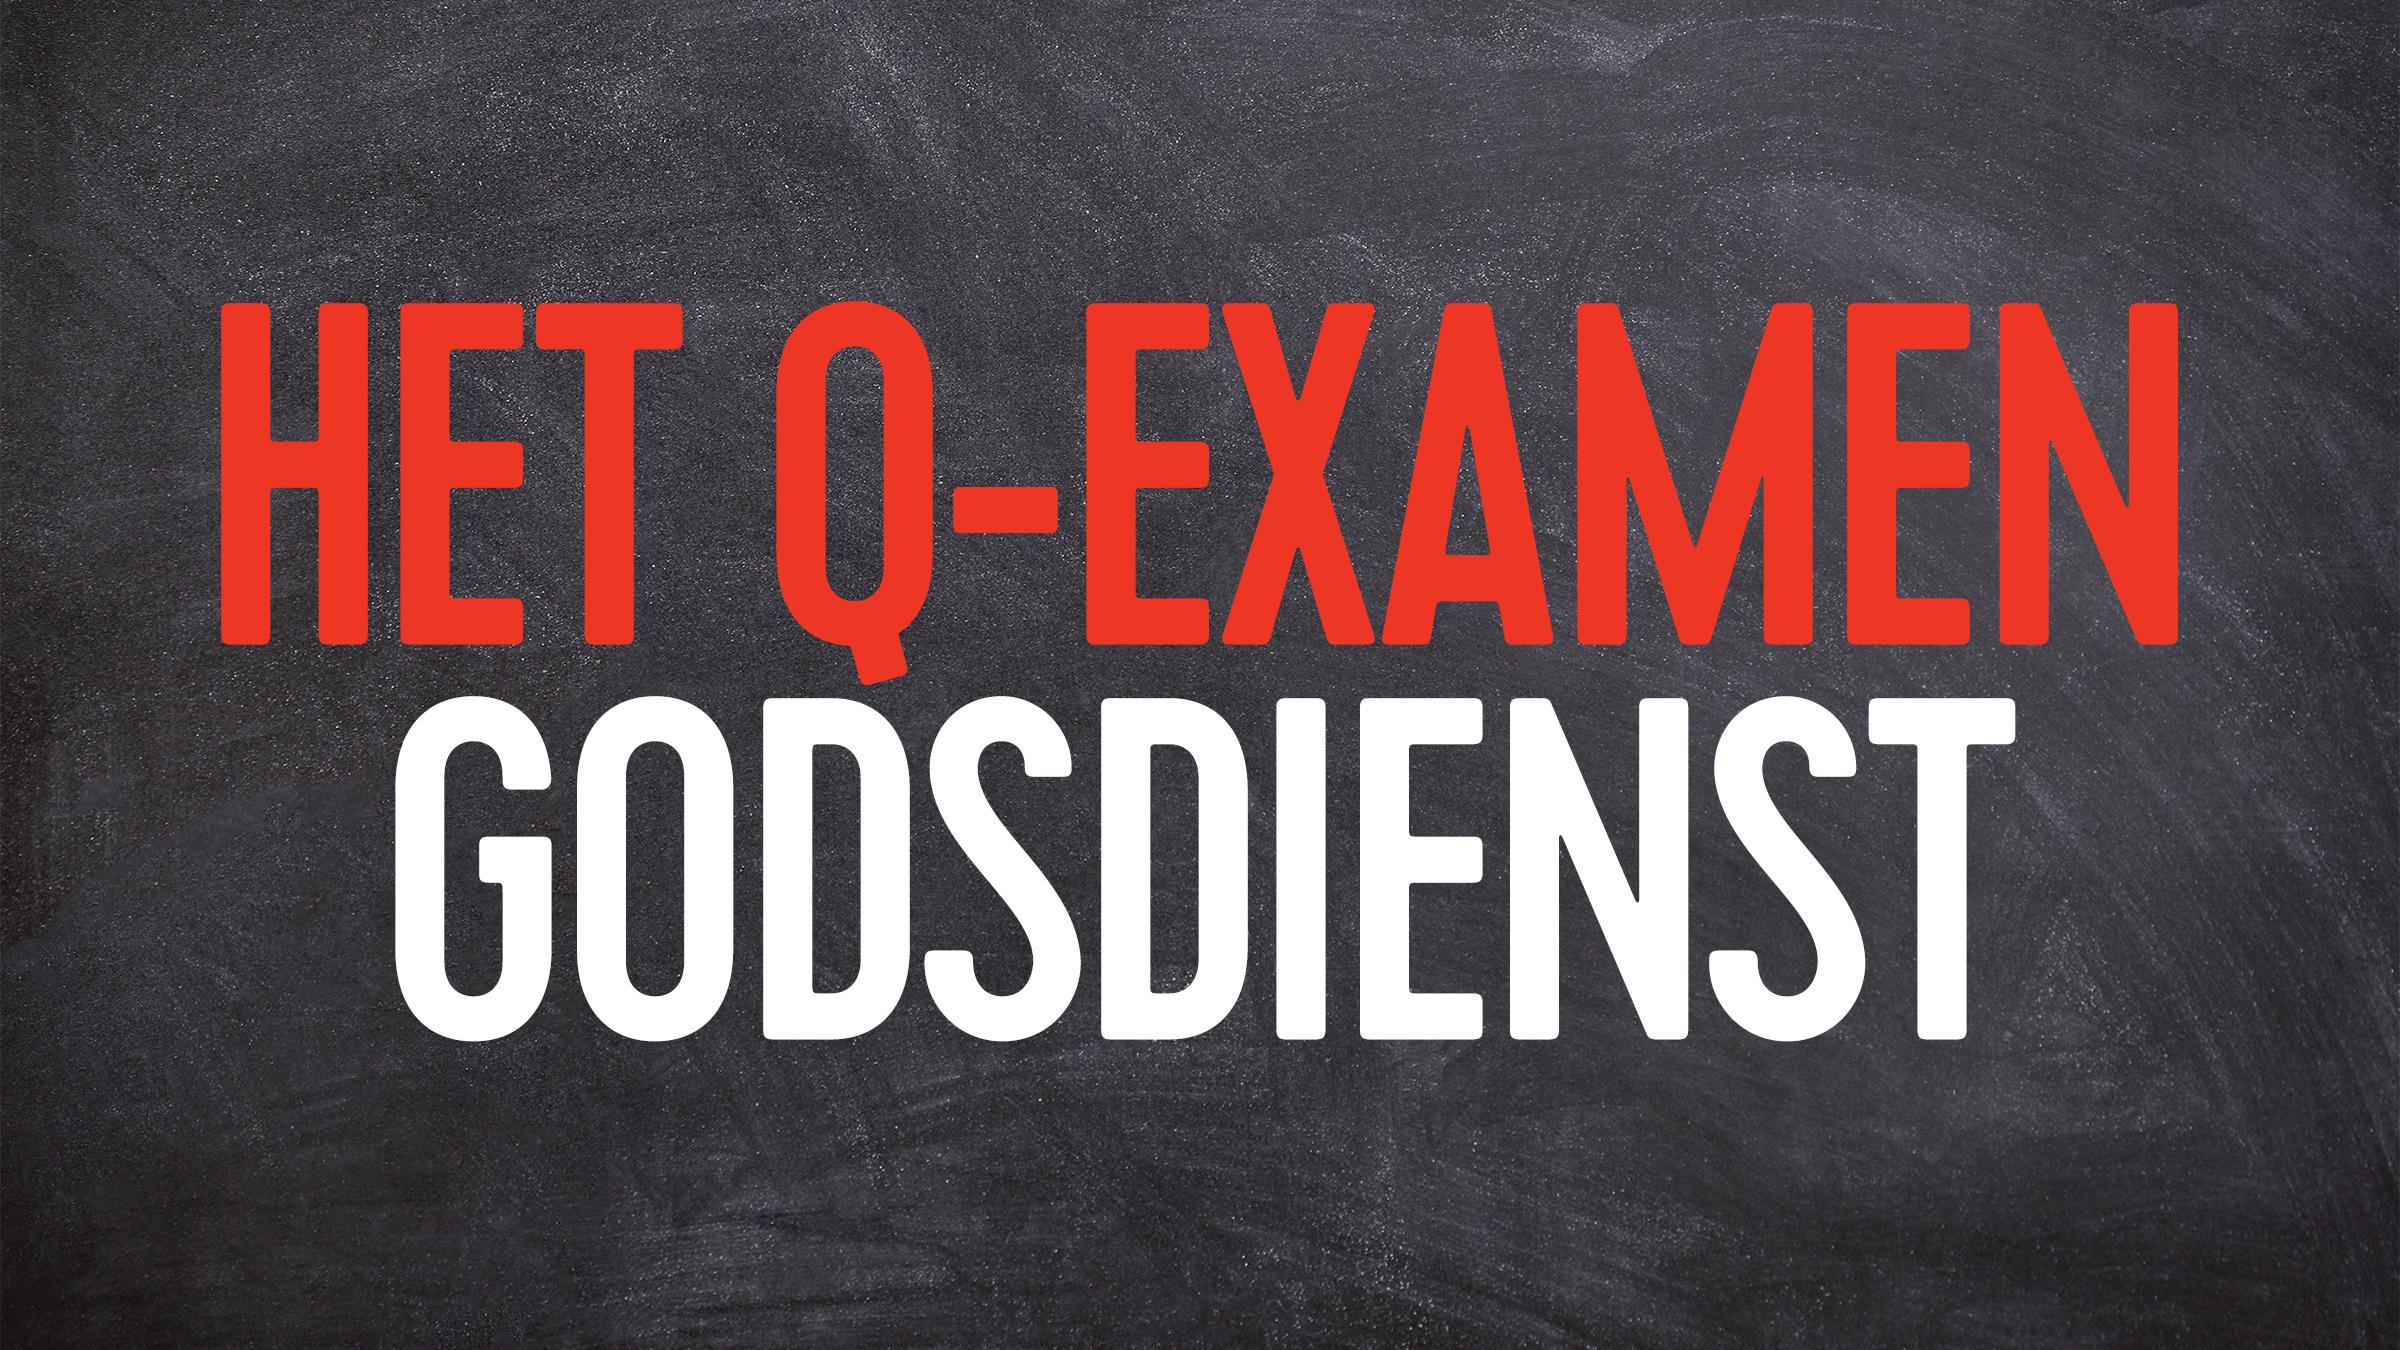 Q examen godsdienst